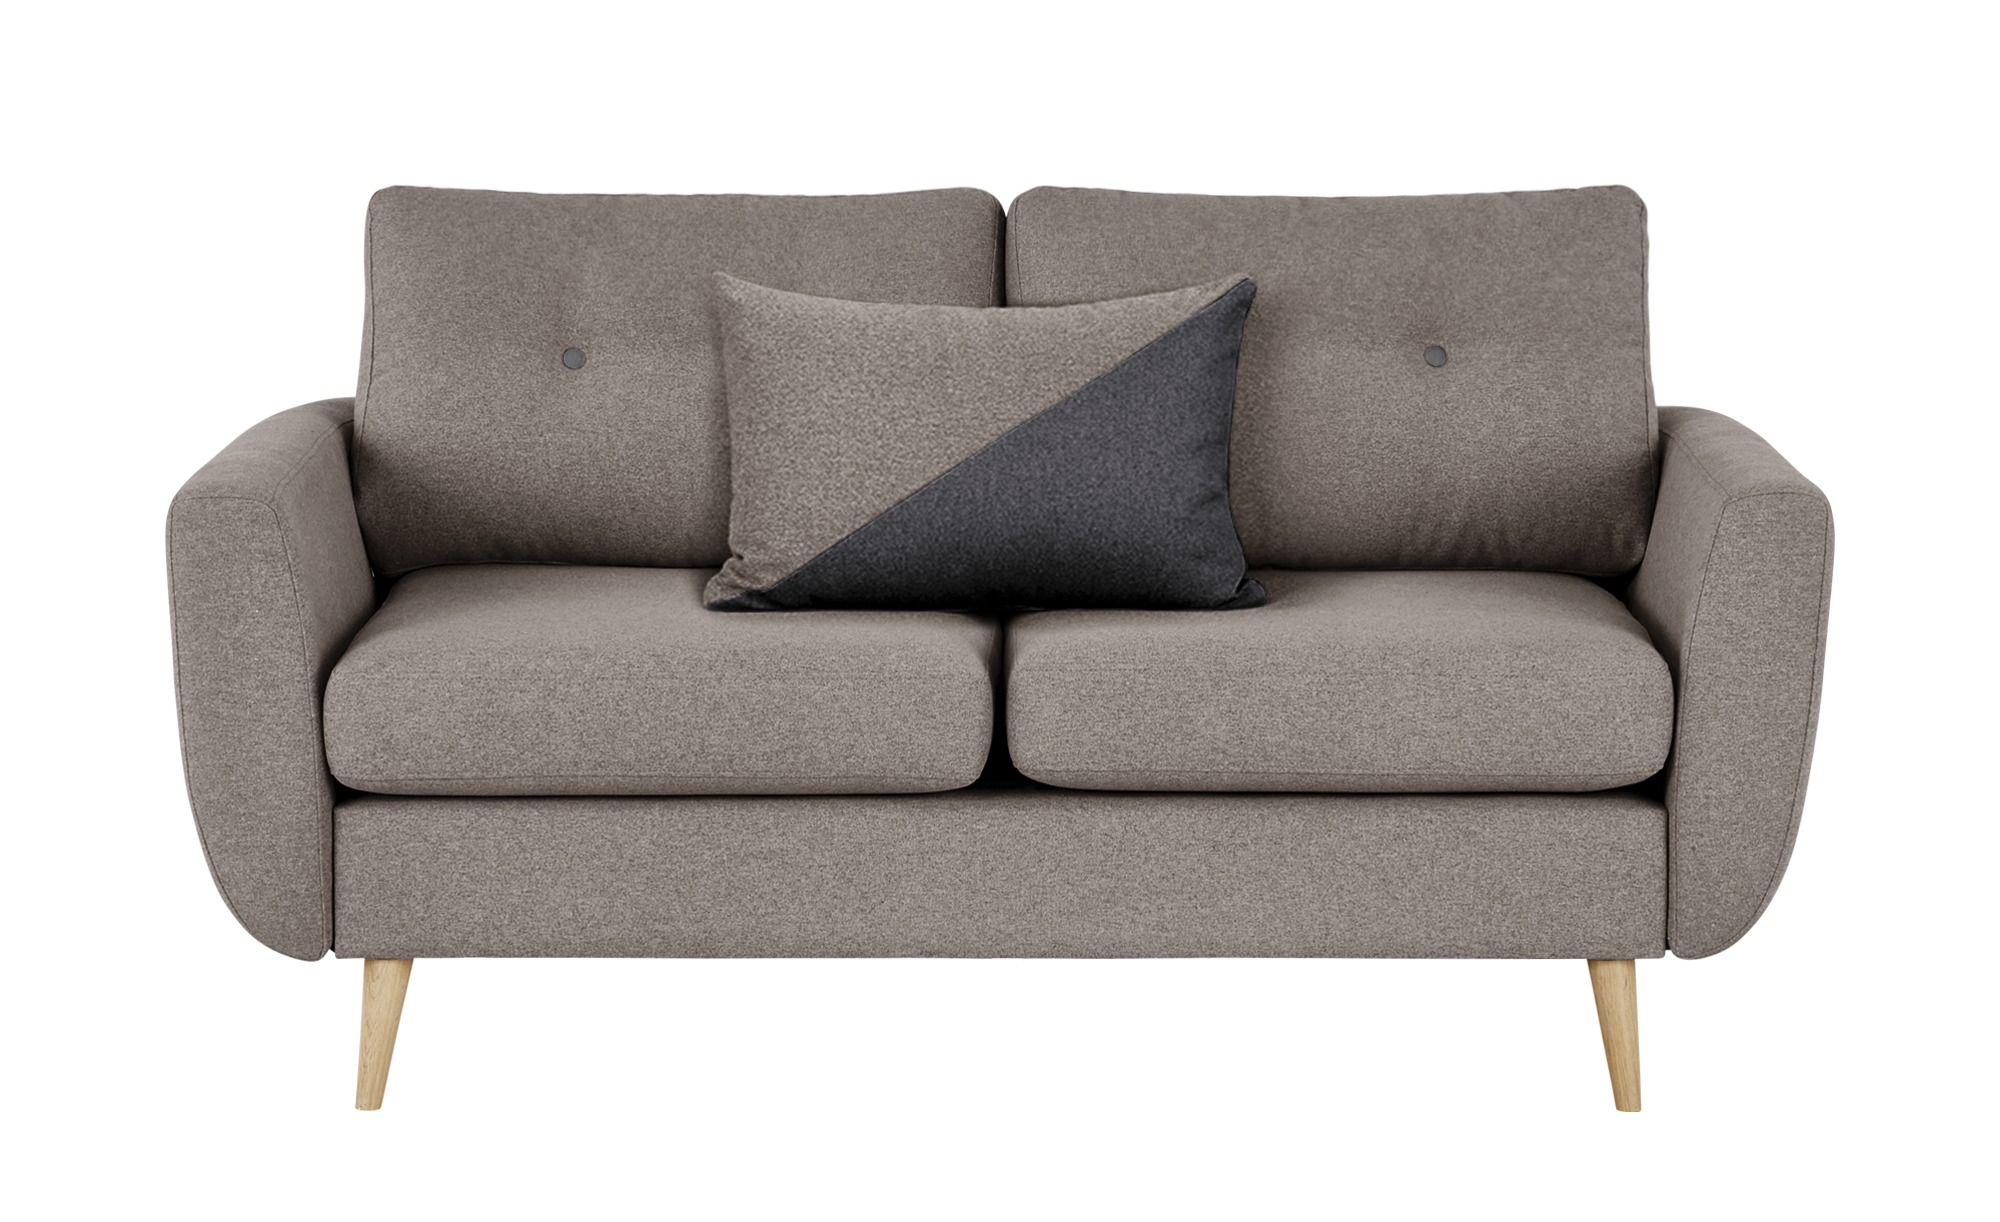 finya Sofa grau-braun - Webstoff Harris ¦ grau ¦ Maße (cm): B: 161 H: 85 T: 92 Polstermöbel > Sofas > 2-Sitzer - Höffner